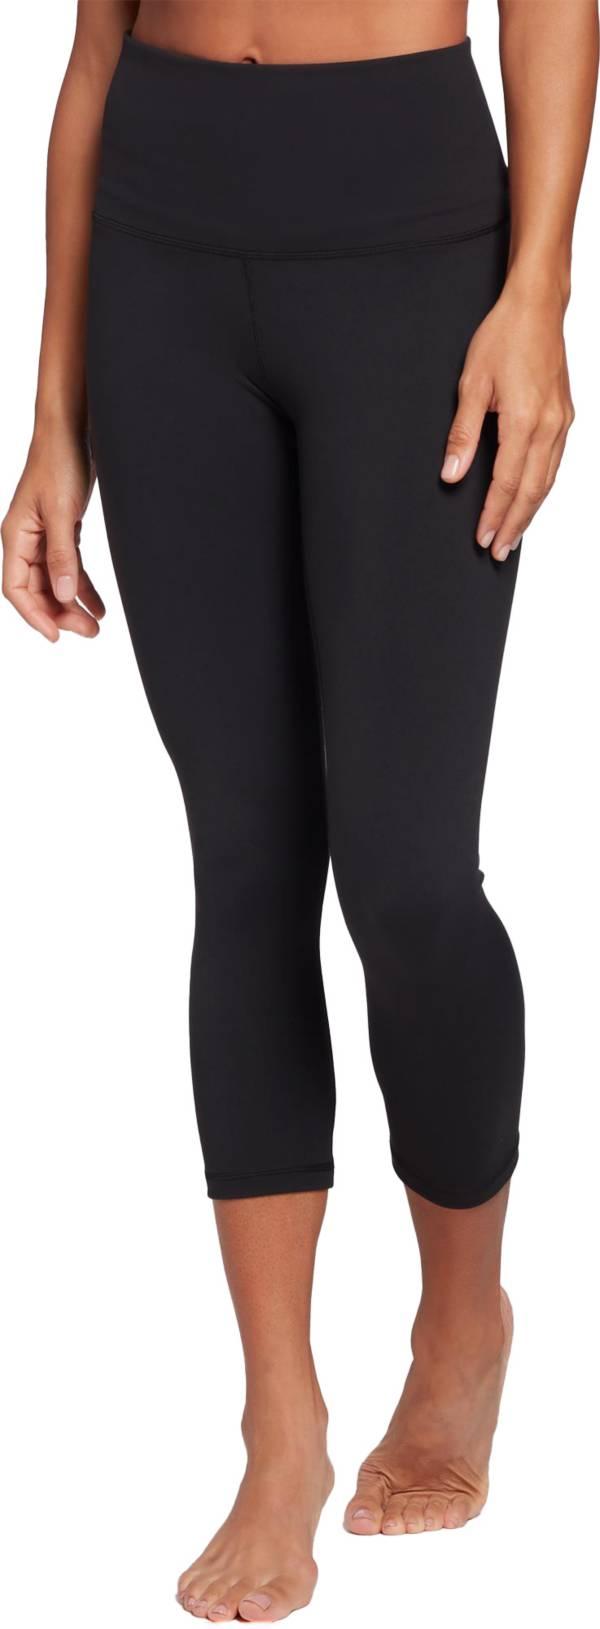 CALIA by Carrie Underwood Women's Core Essential Capri Leggings product image